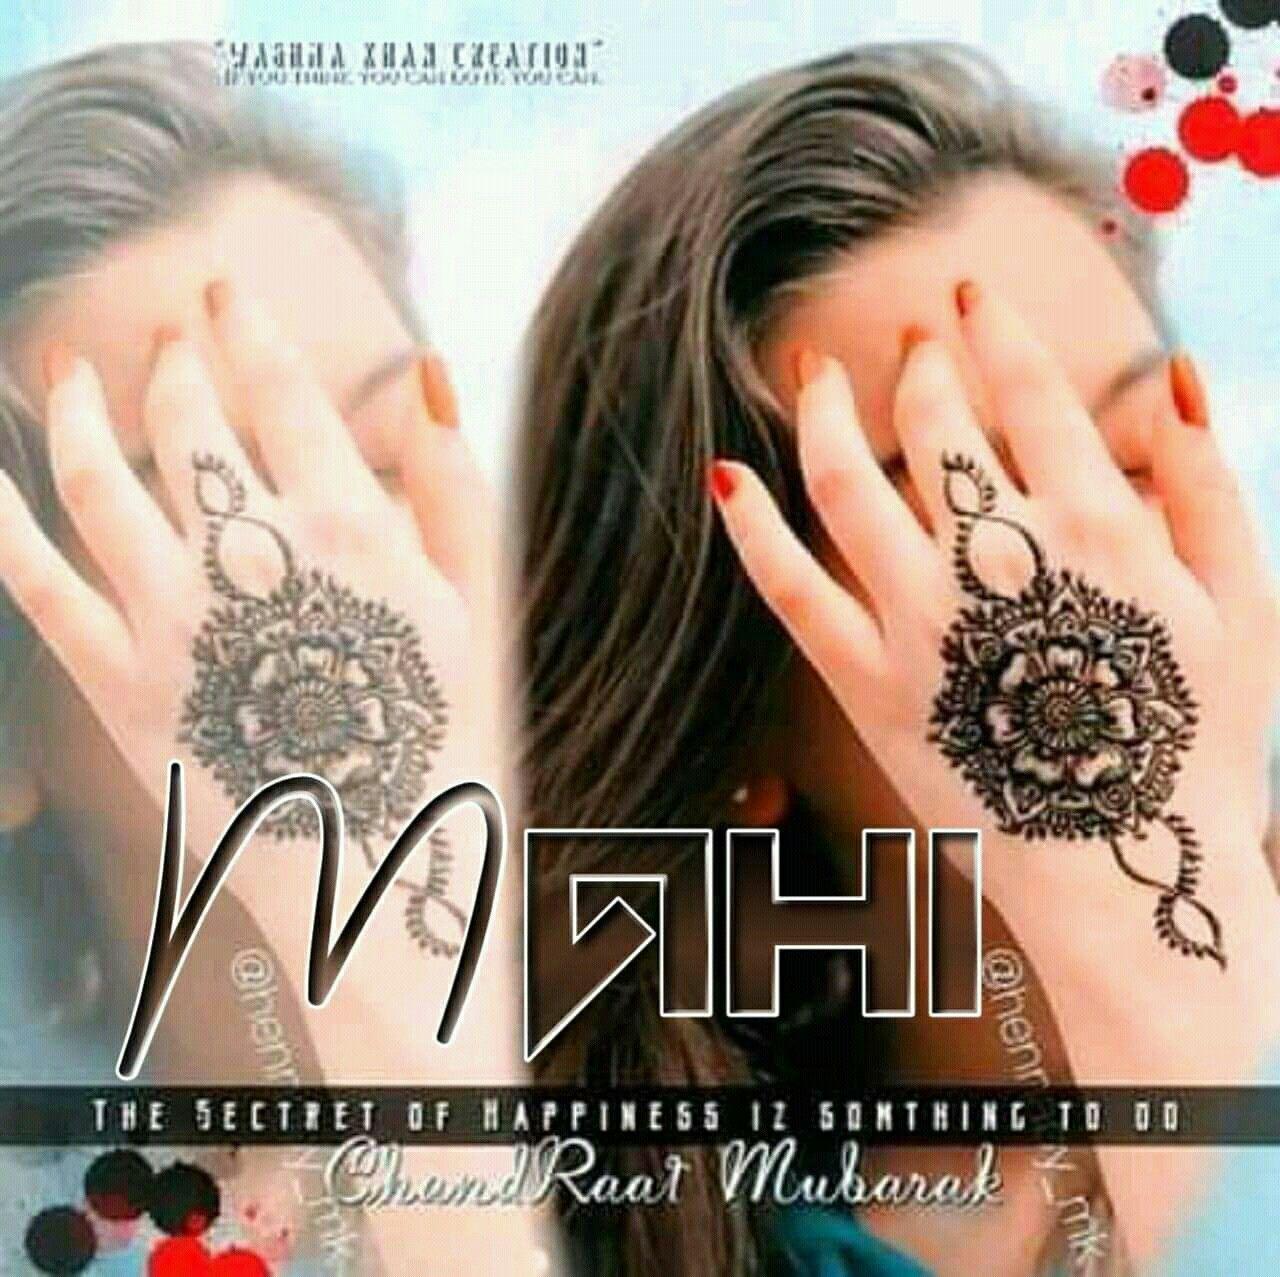 Pin By Mahi On Mahi Anmol Name Dpz In 2020 Henna Hand Tattoo Hand Henna Hand Tattoos